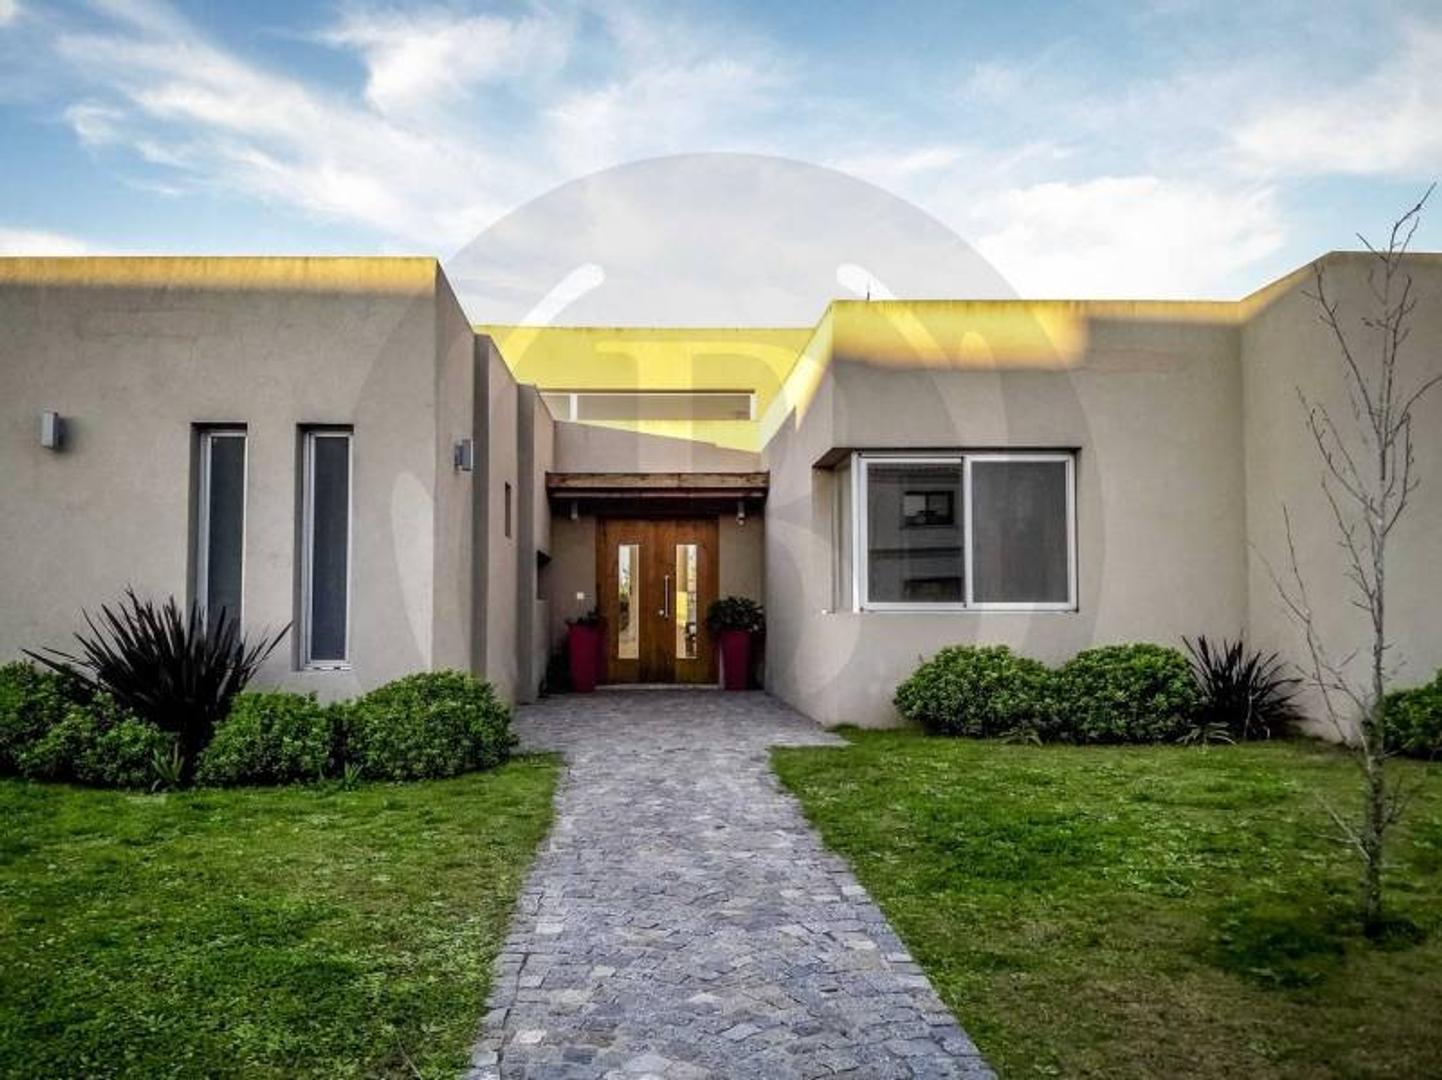 BUSTAMANTE PROPIEDADES - SAN ISIDRO LABRADOR - 7457 Venta Casa